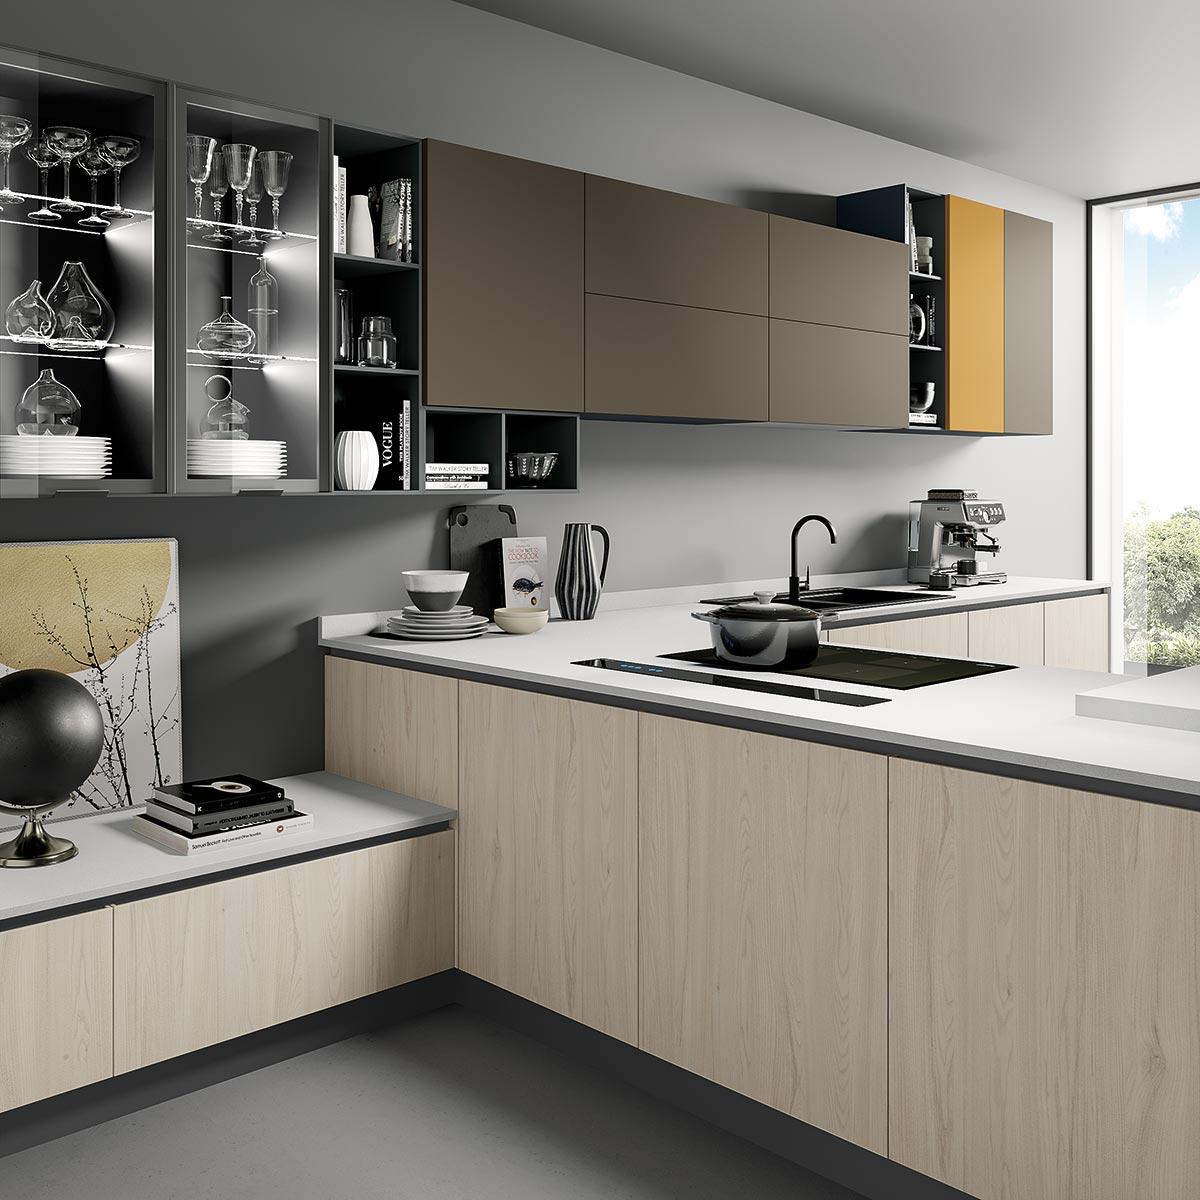 Mobilturi catalogo 2021: le proposte cucina simbolo del made in Italy